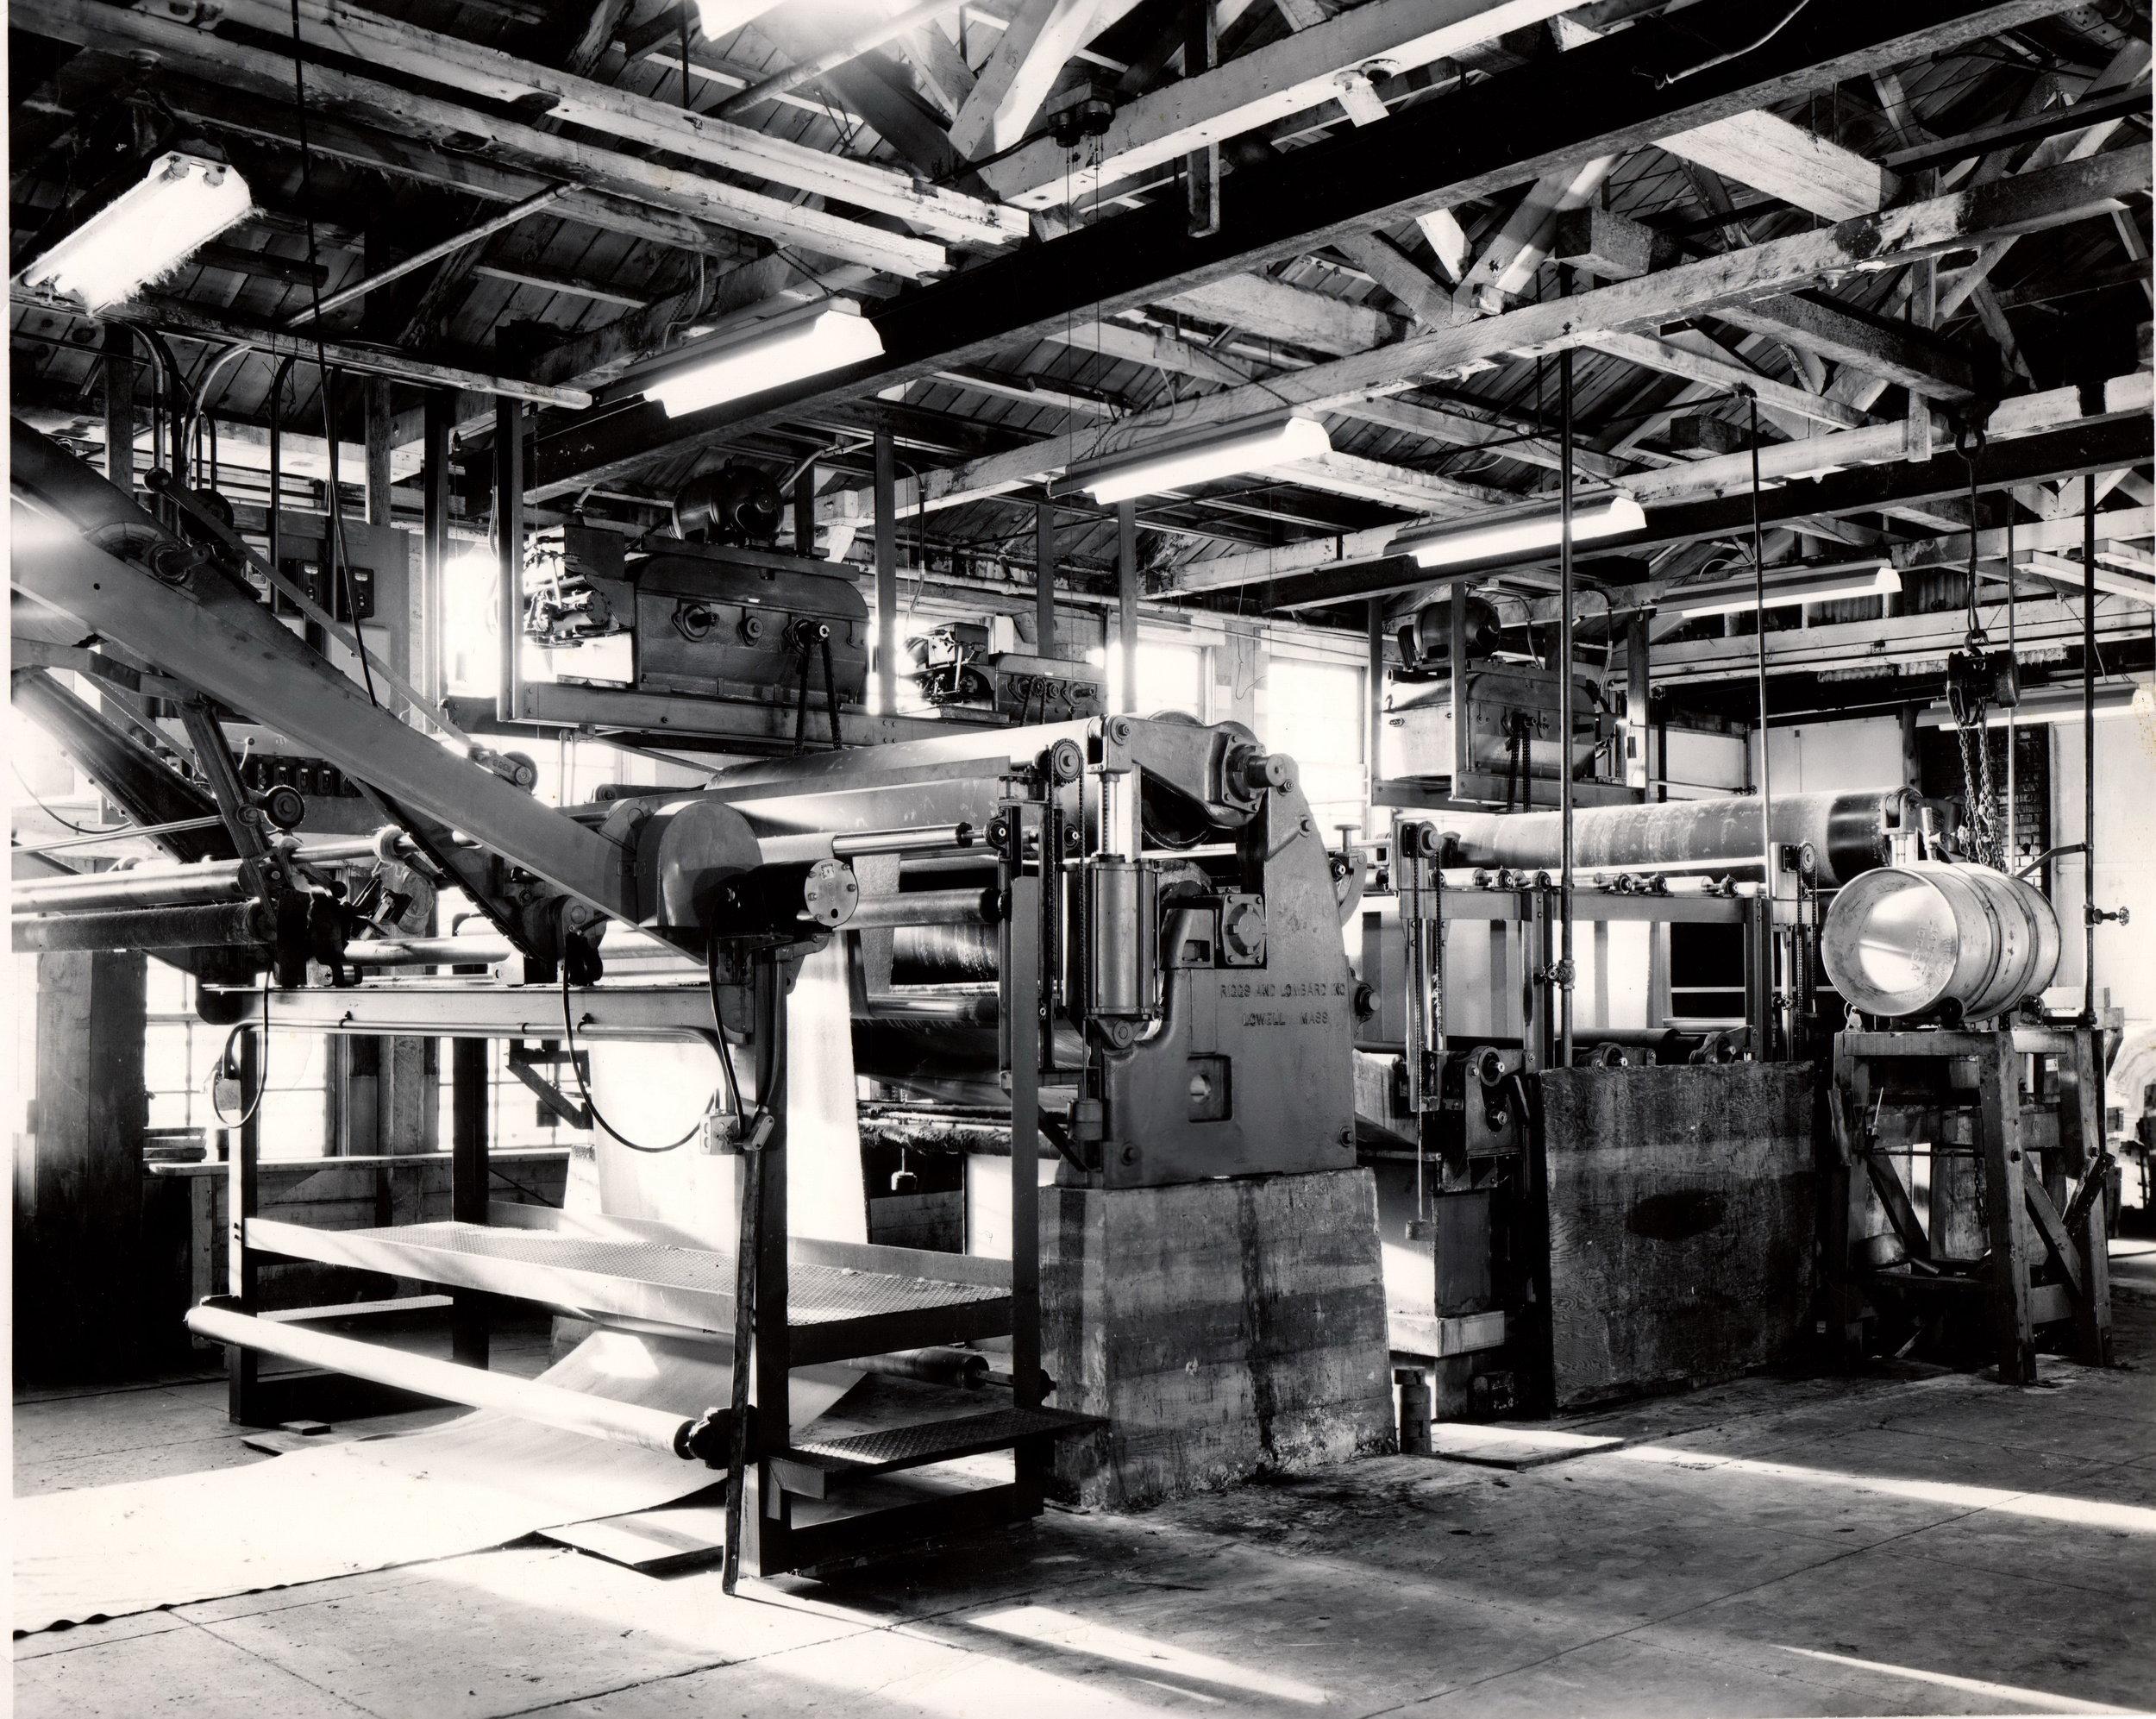 Portland Woolen Mills machinery in operation